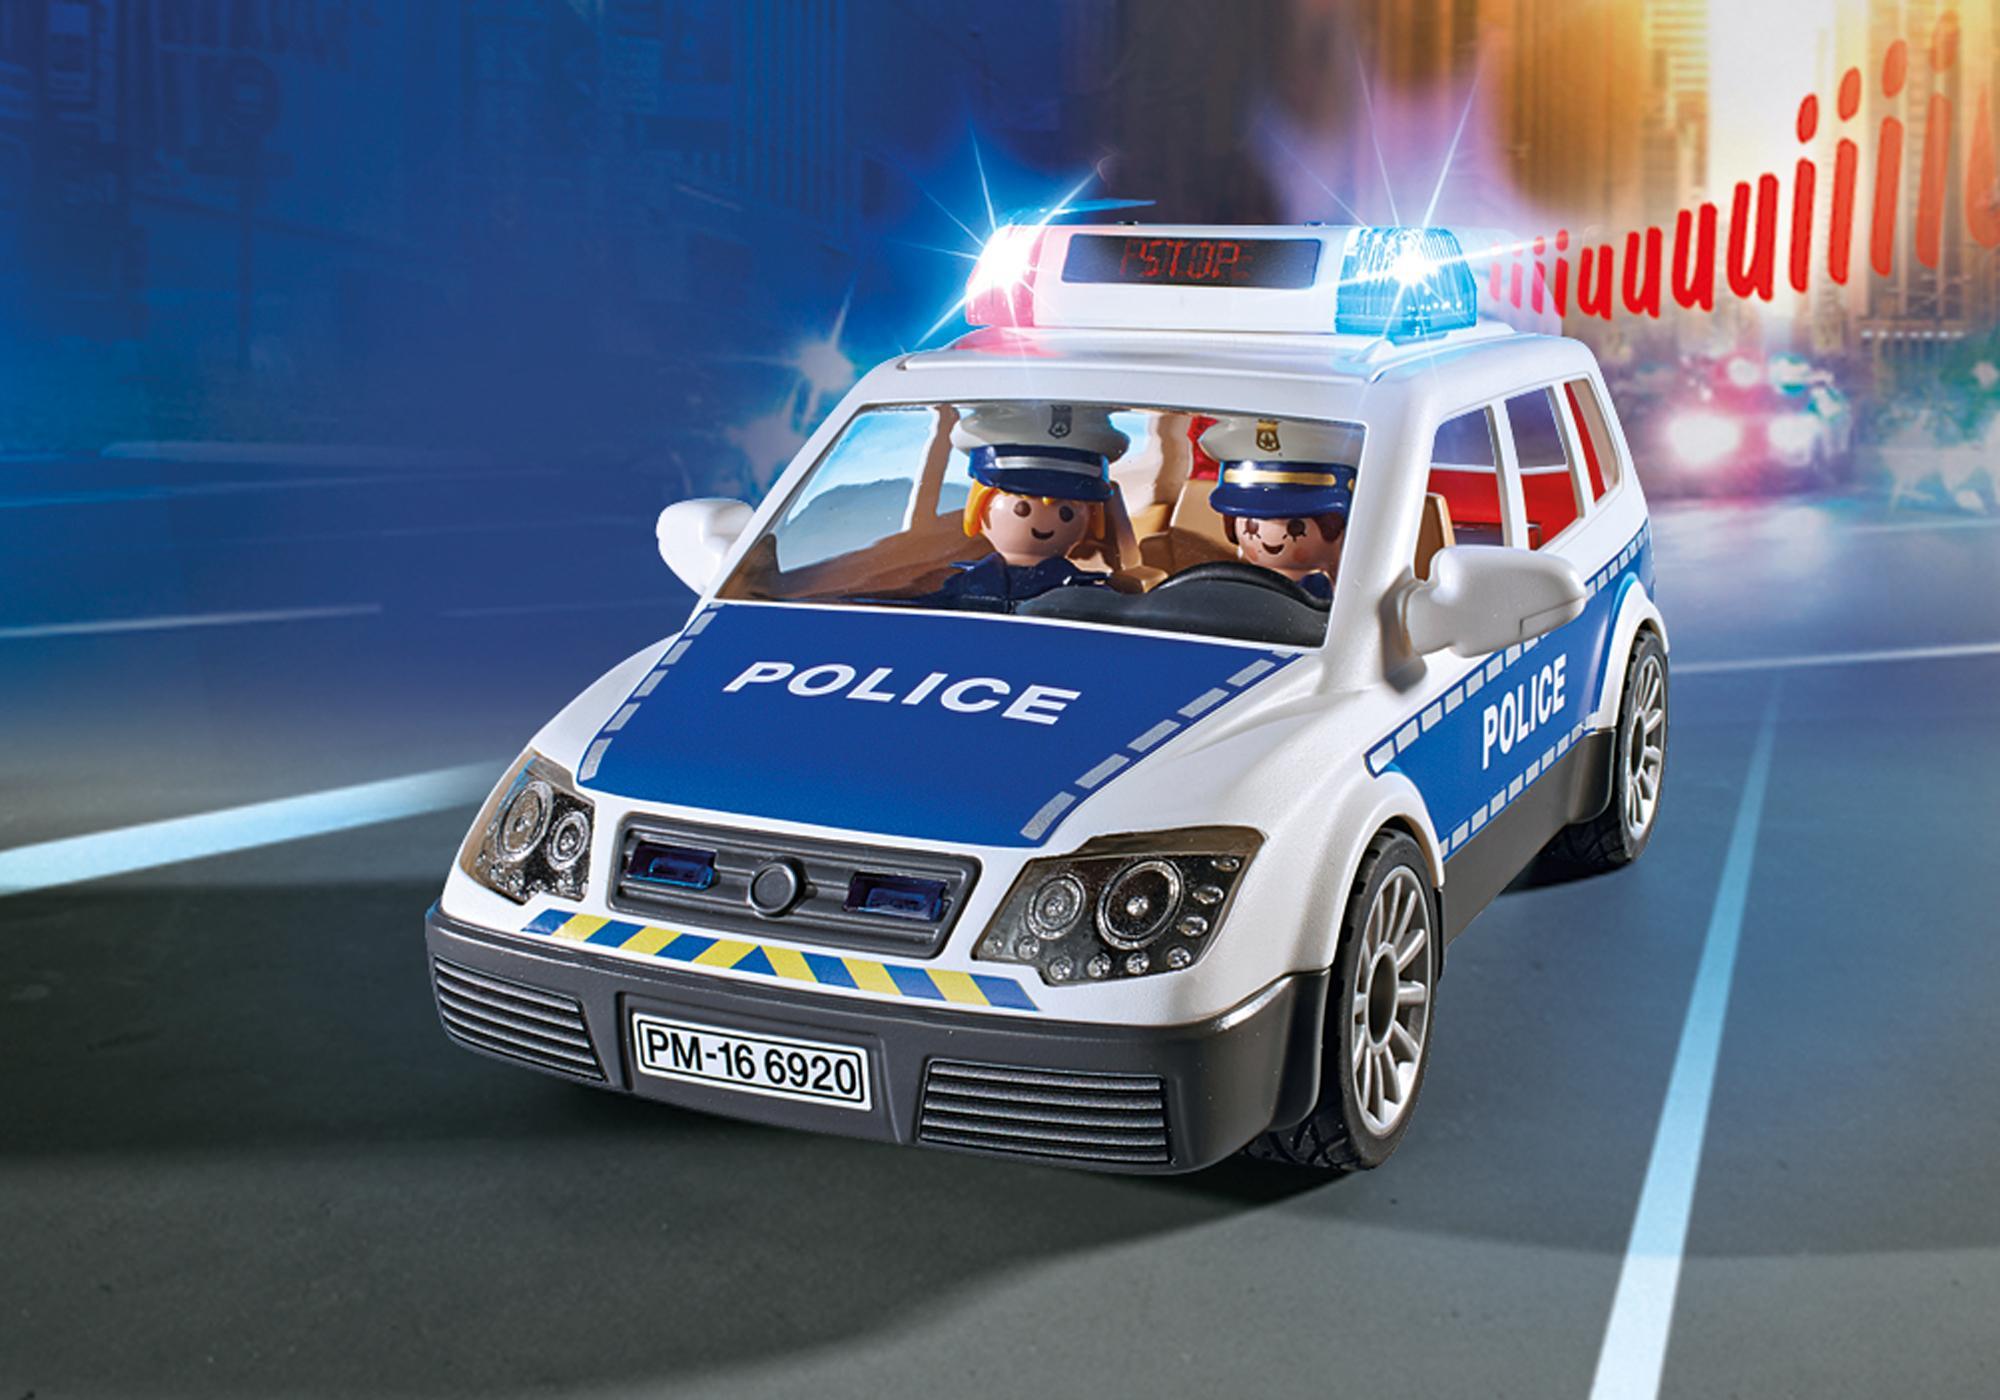 http://media.playmobil.com/i/playmobil/6873_product_extra1/Polizei-Einsatzwagen